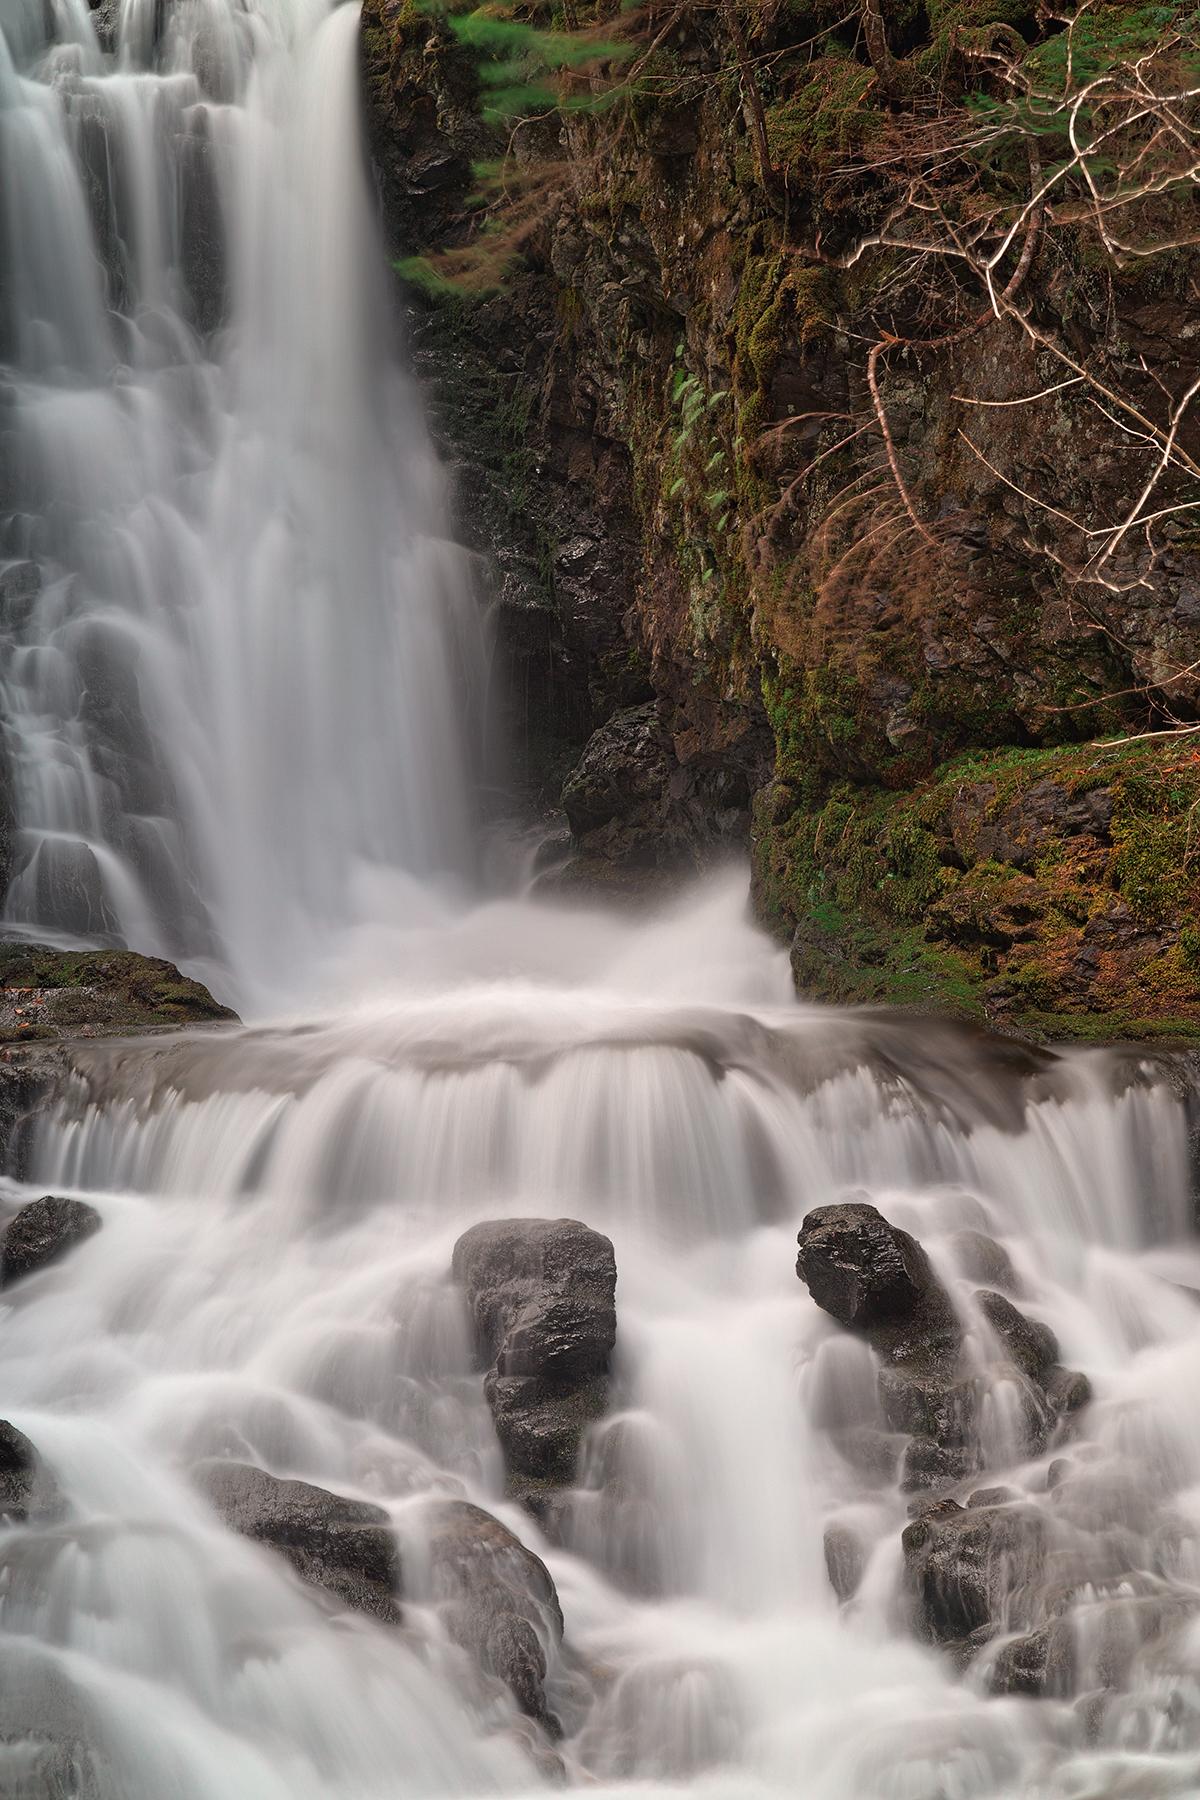 Dickson Falls - HDR, Atmosphere, Rock, River, Range, HQ Photo